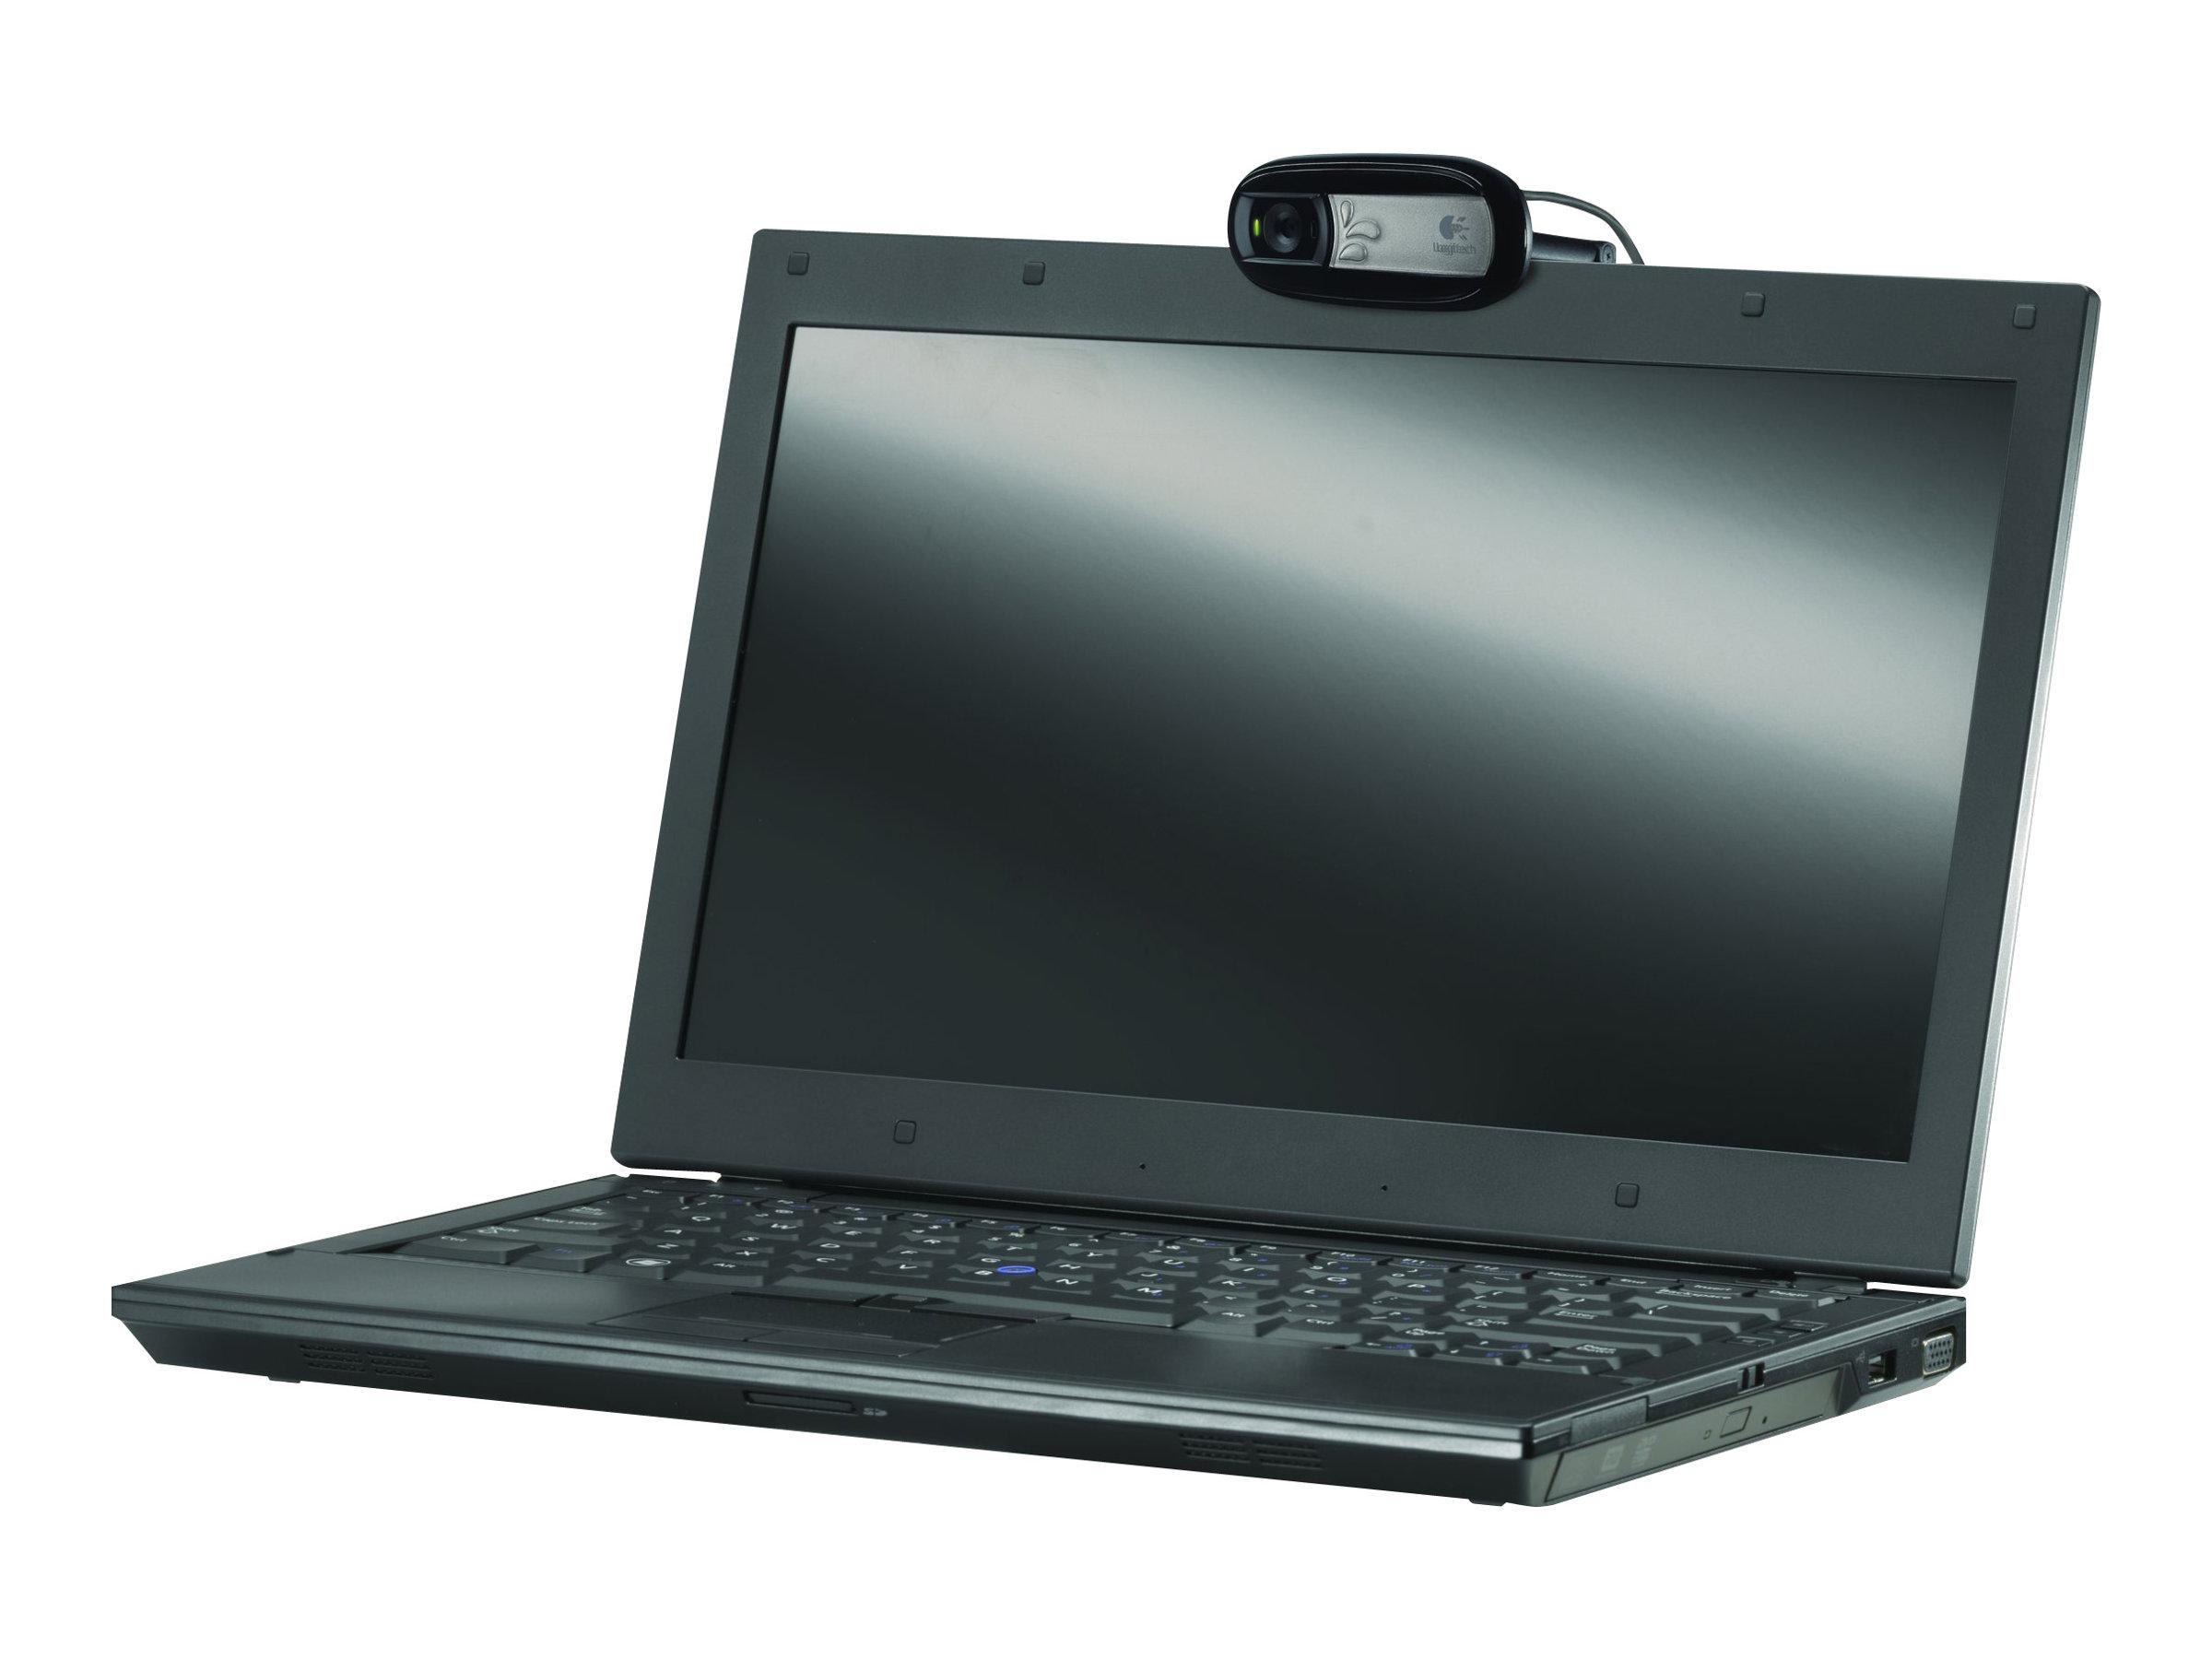 Logitech Webcam C170 - Web-Kamera - Farbe - 1024 x 768 - Audio - USB 2.0